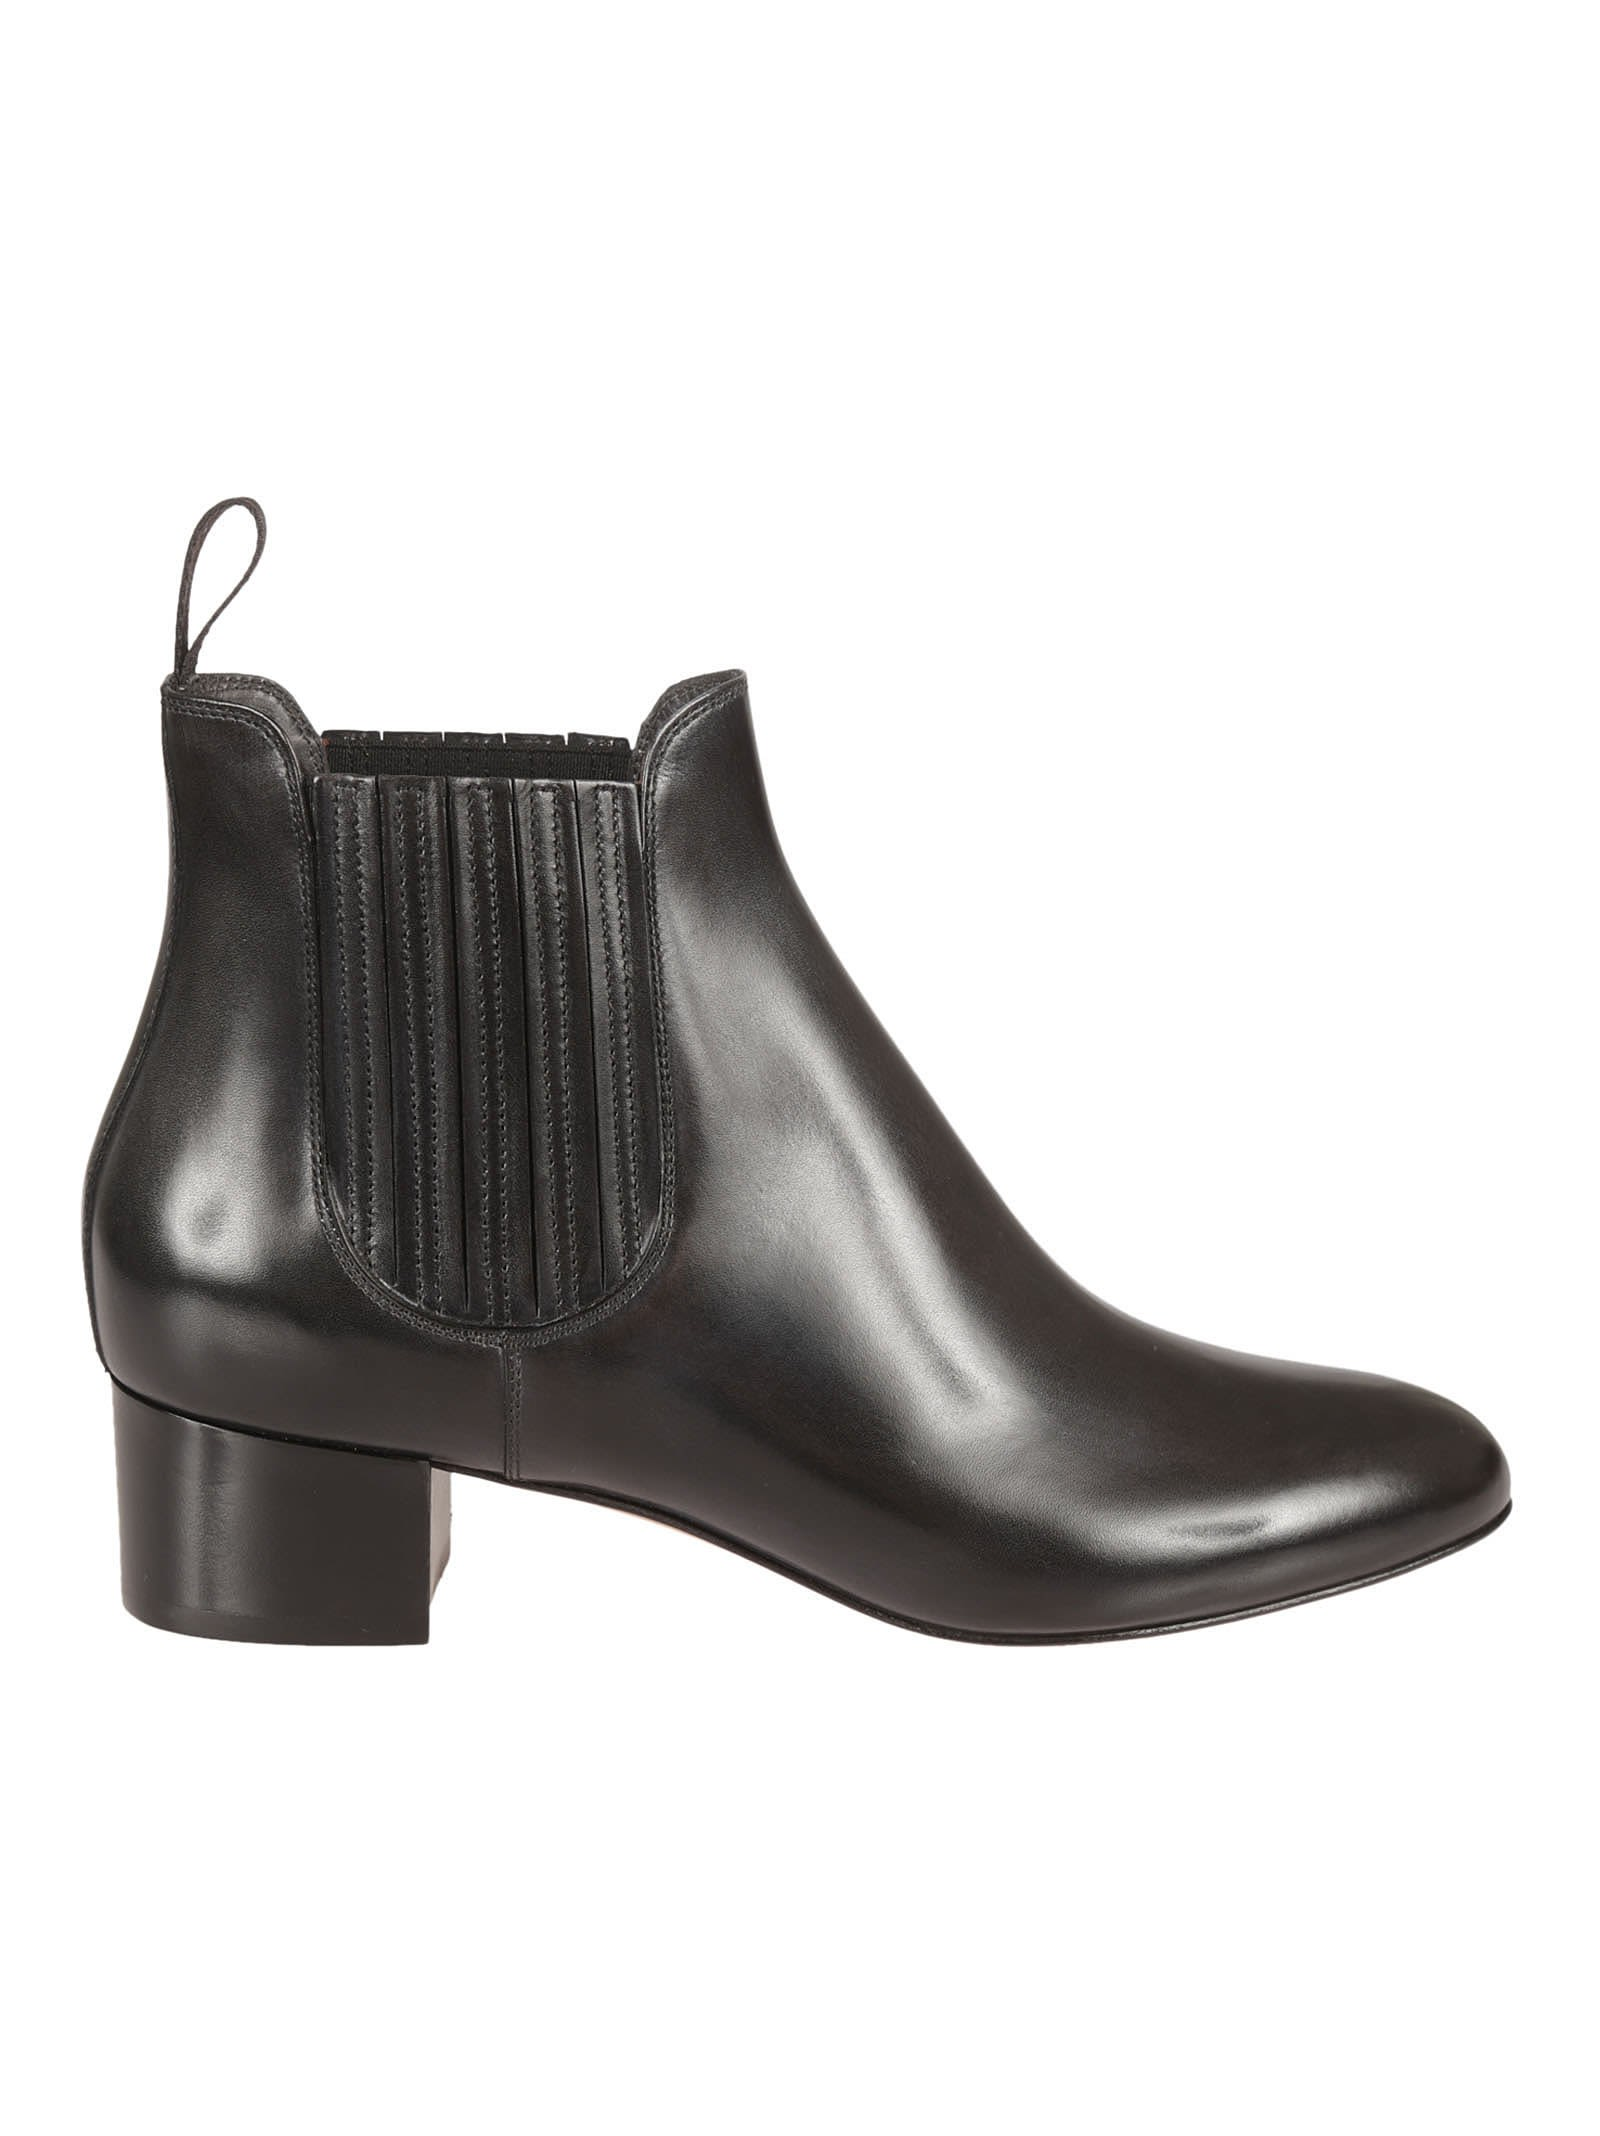 Santoni Black Calf Ankle Boots